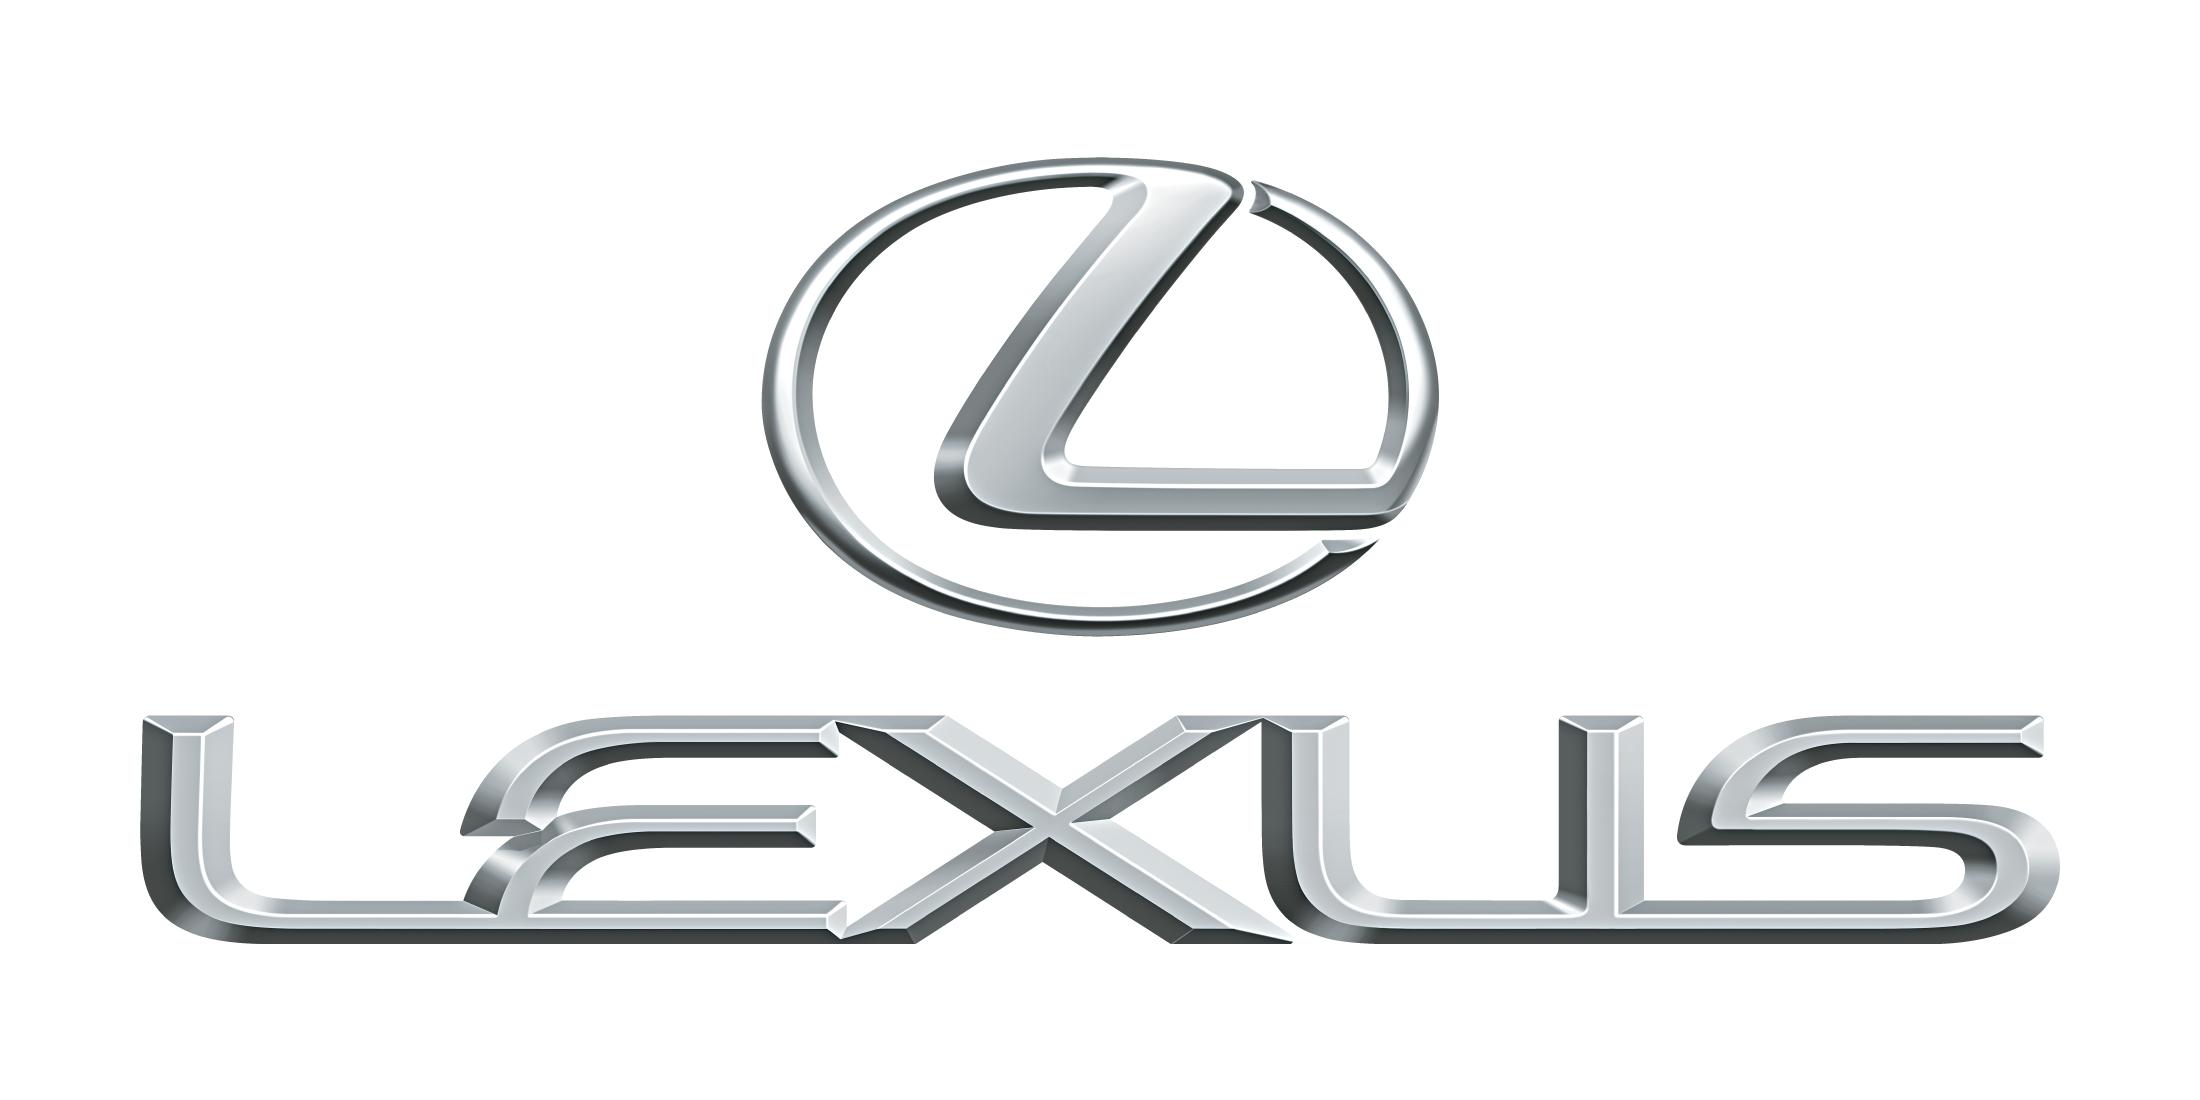 car_logo_PNG1651.png